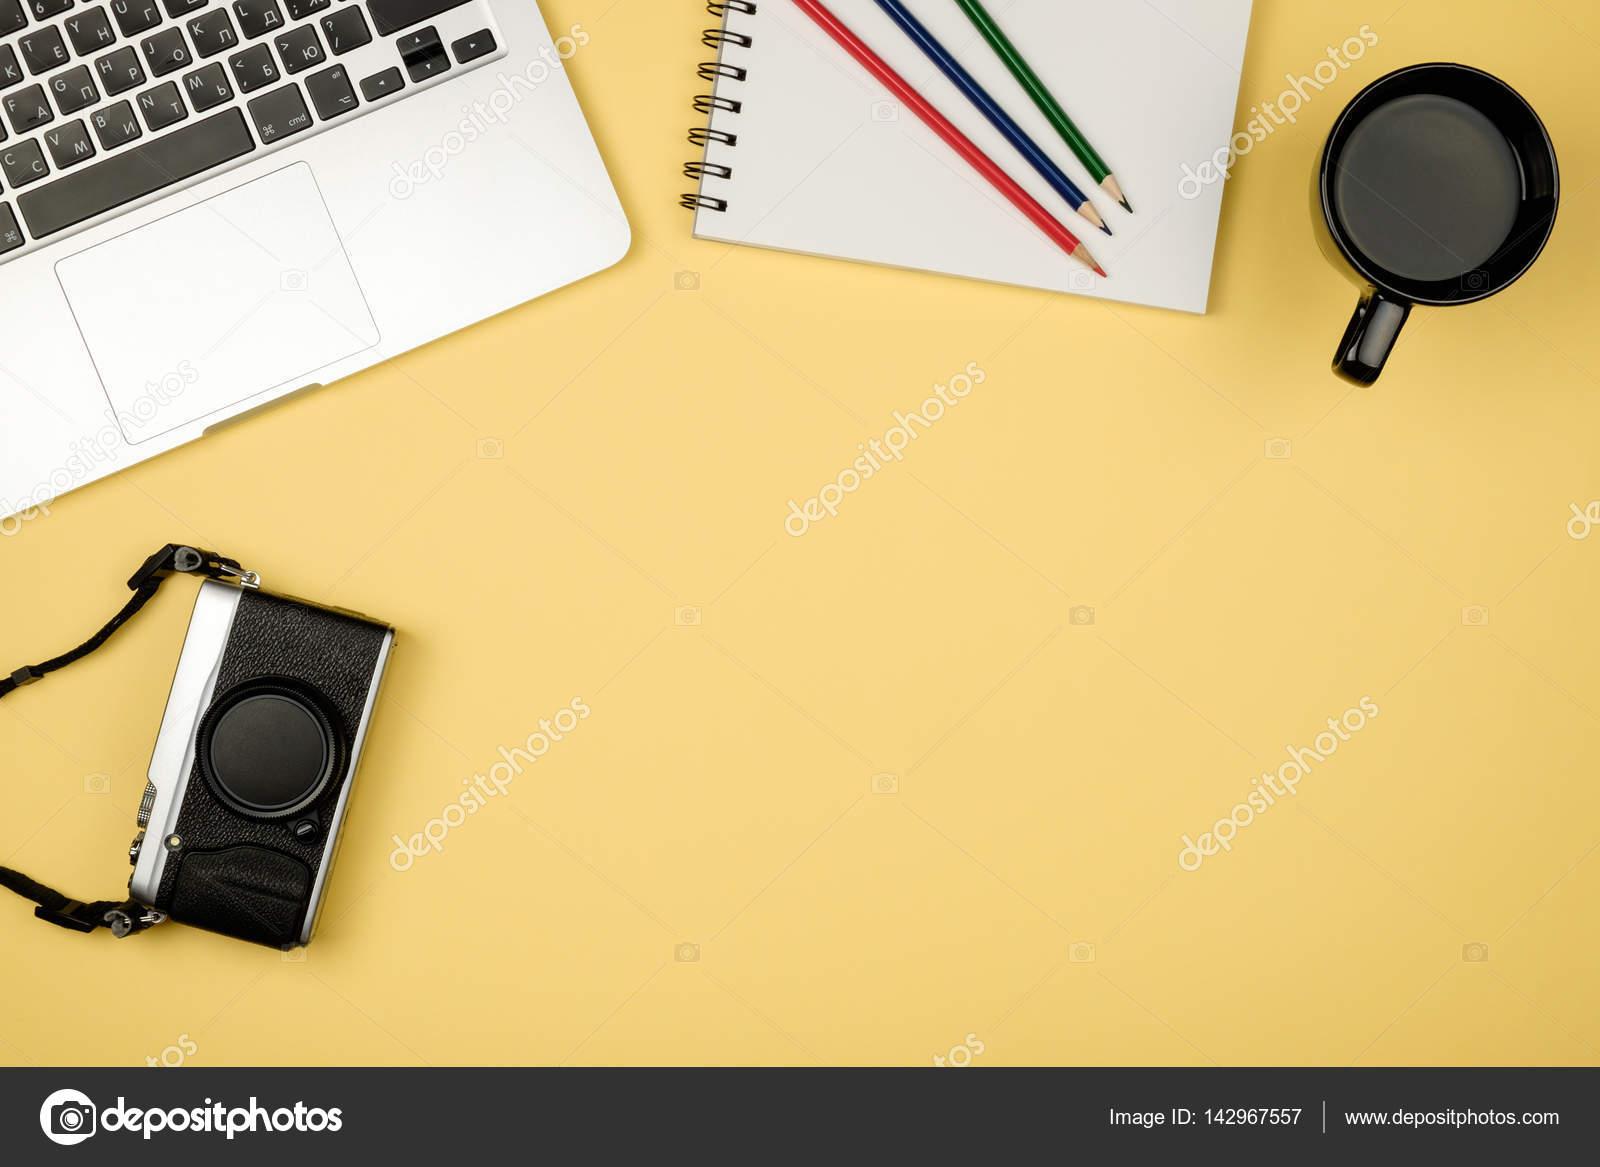 https://st3.depositphotos.com/3450477/14296/i/1600/depositphotos_142967557-stock-photo-high-angle-view-of-office.jpg